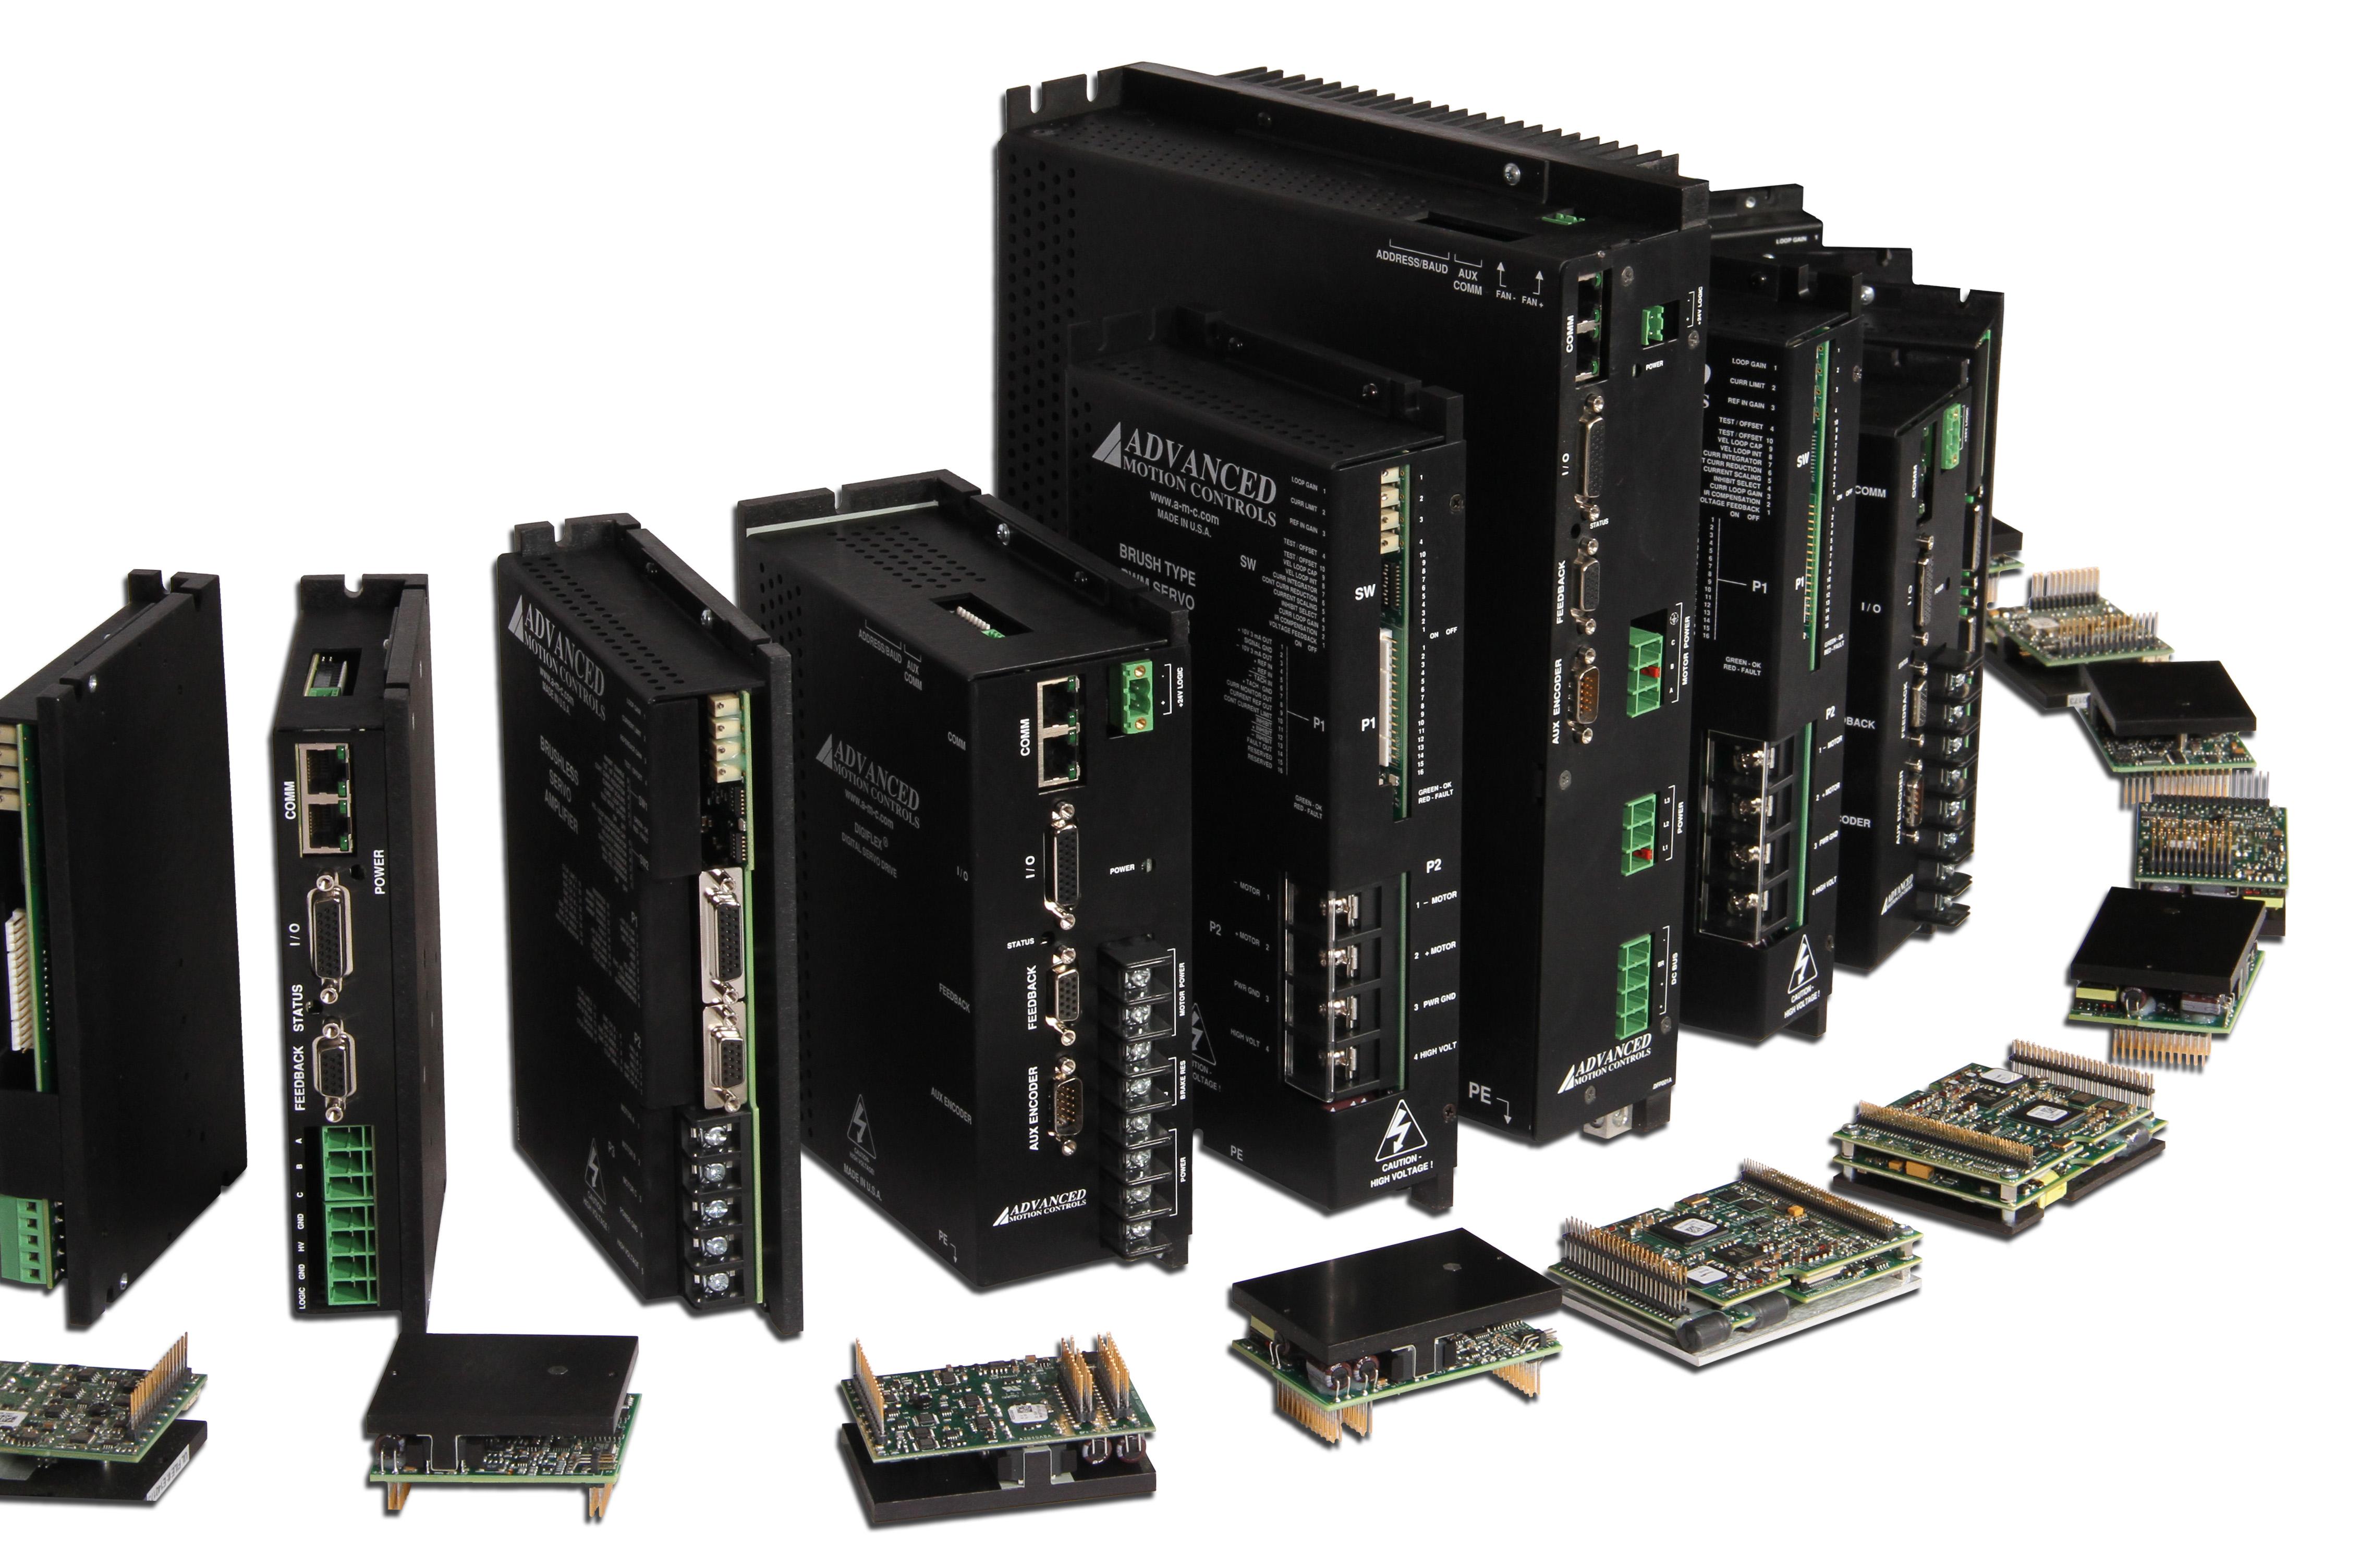 analog and digital servo drives